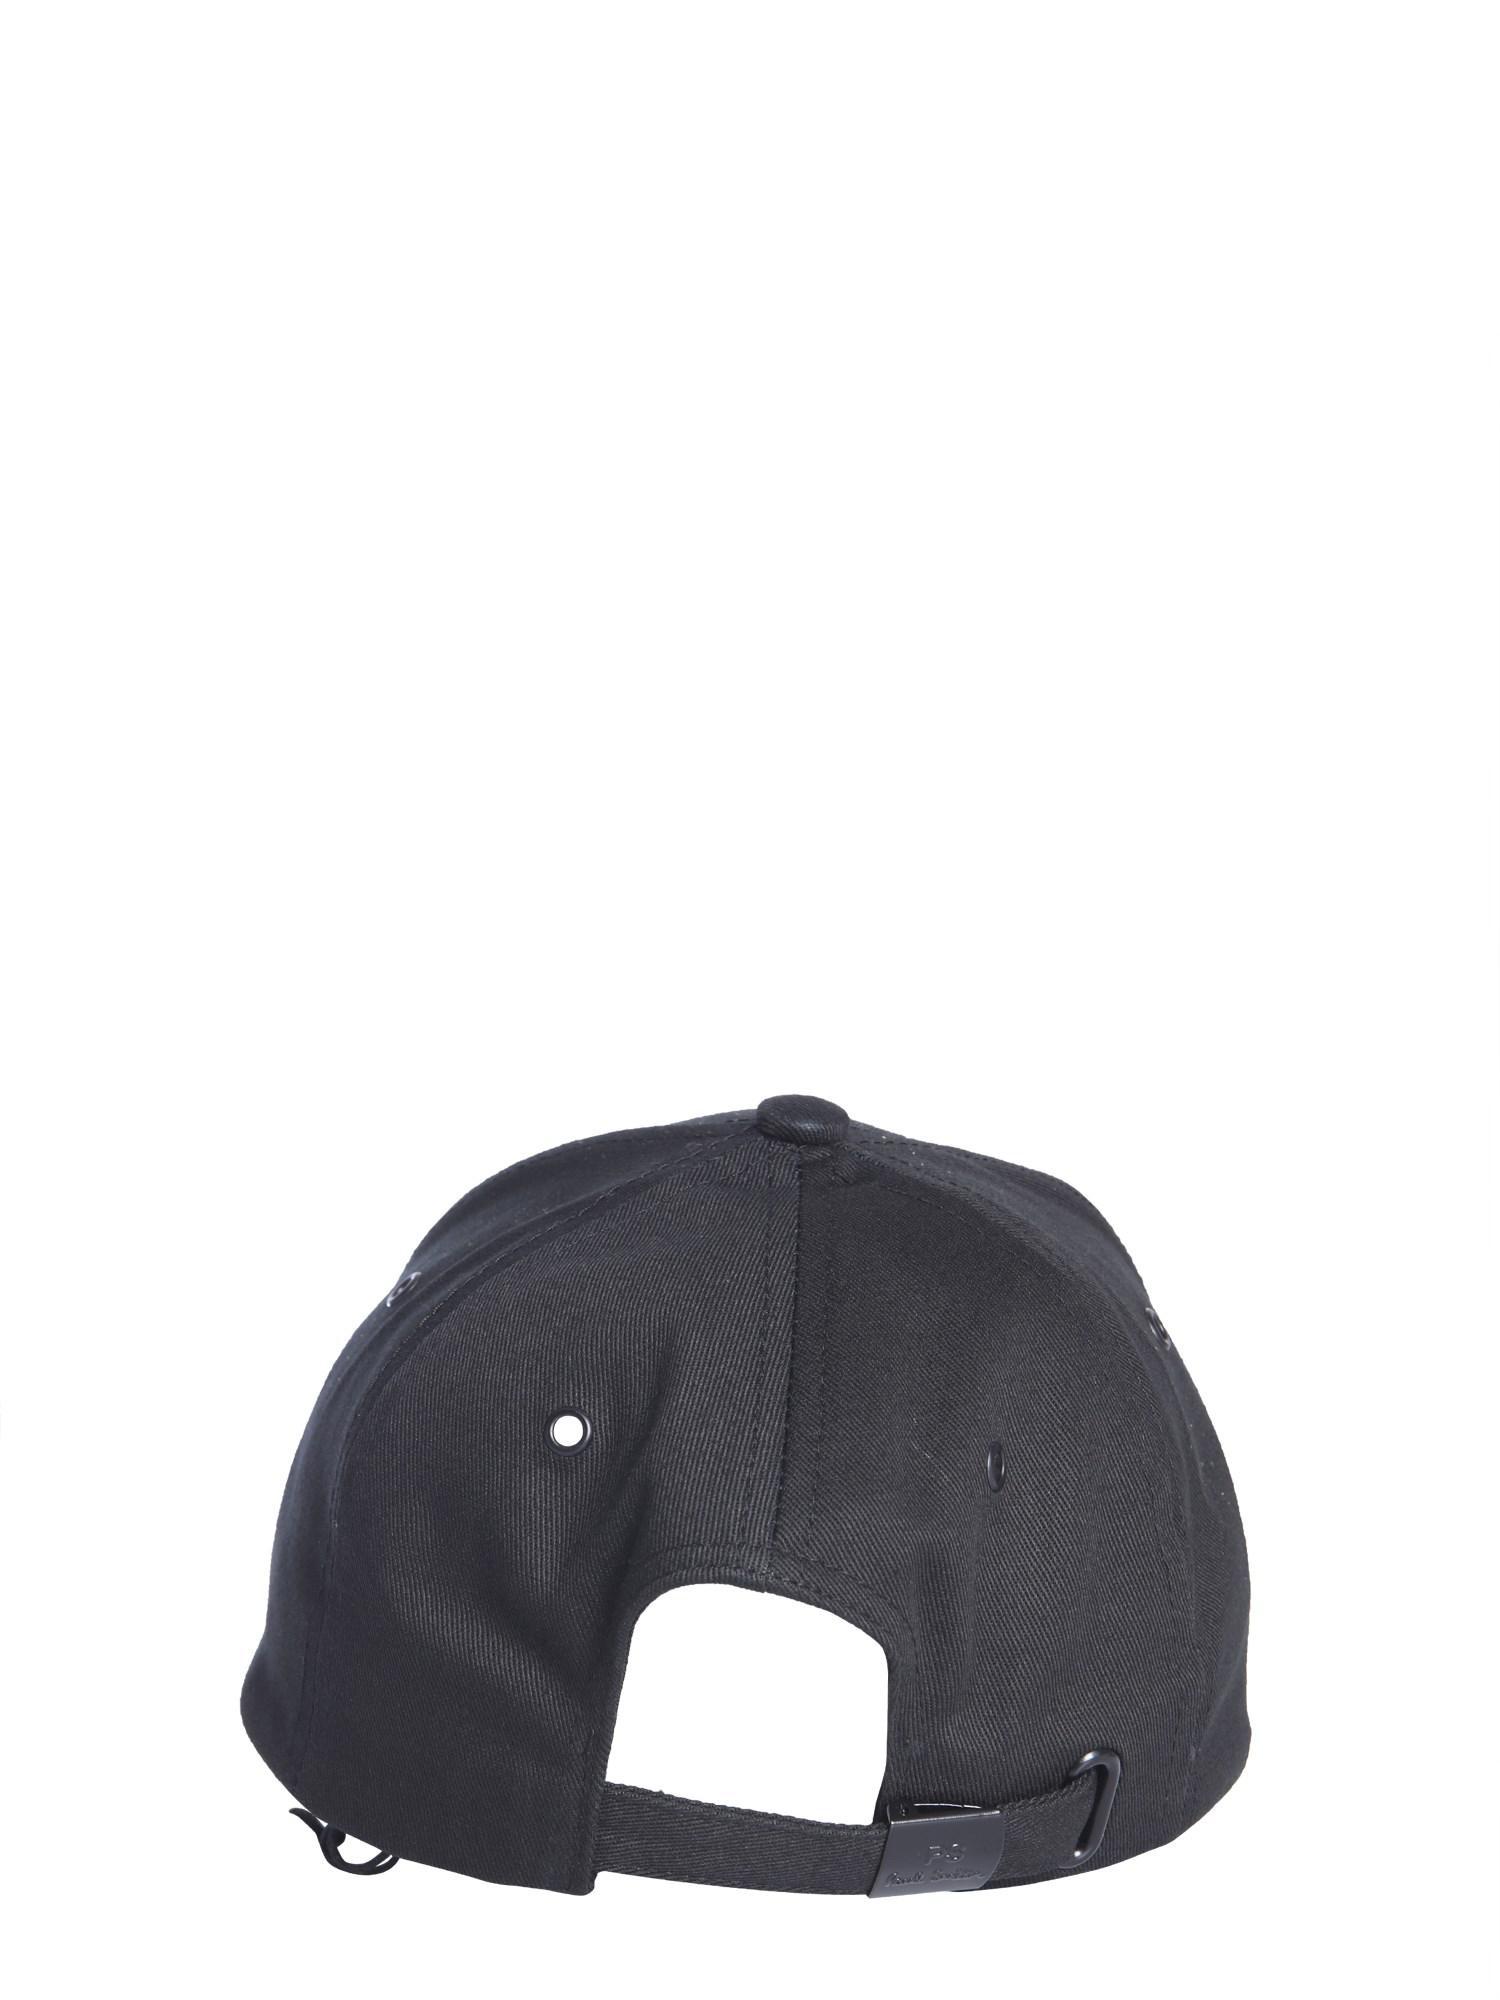 Ps By Paul Smith Cappello Da Baseball In Cotone in Black for Men - Lyst 8ad44ce57795